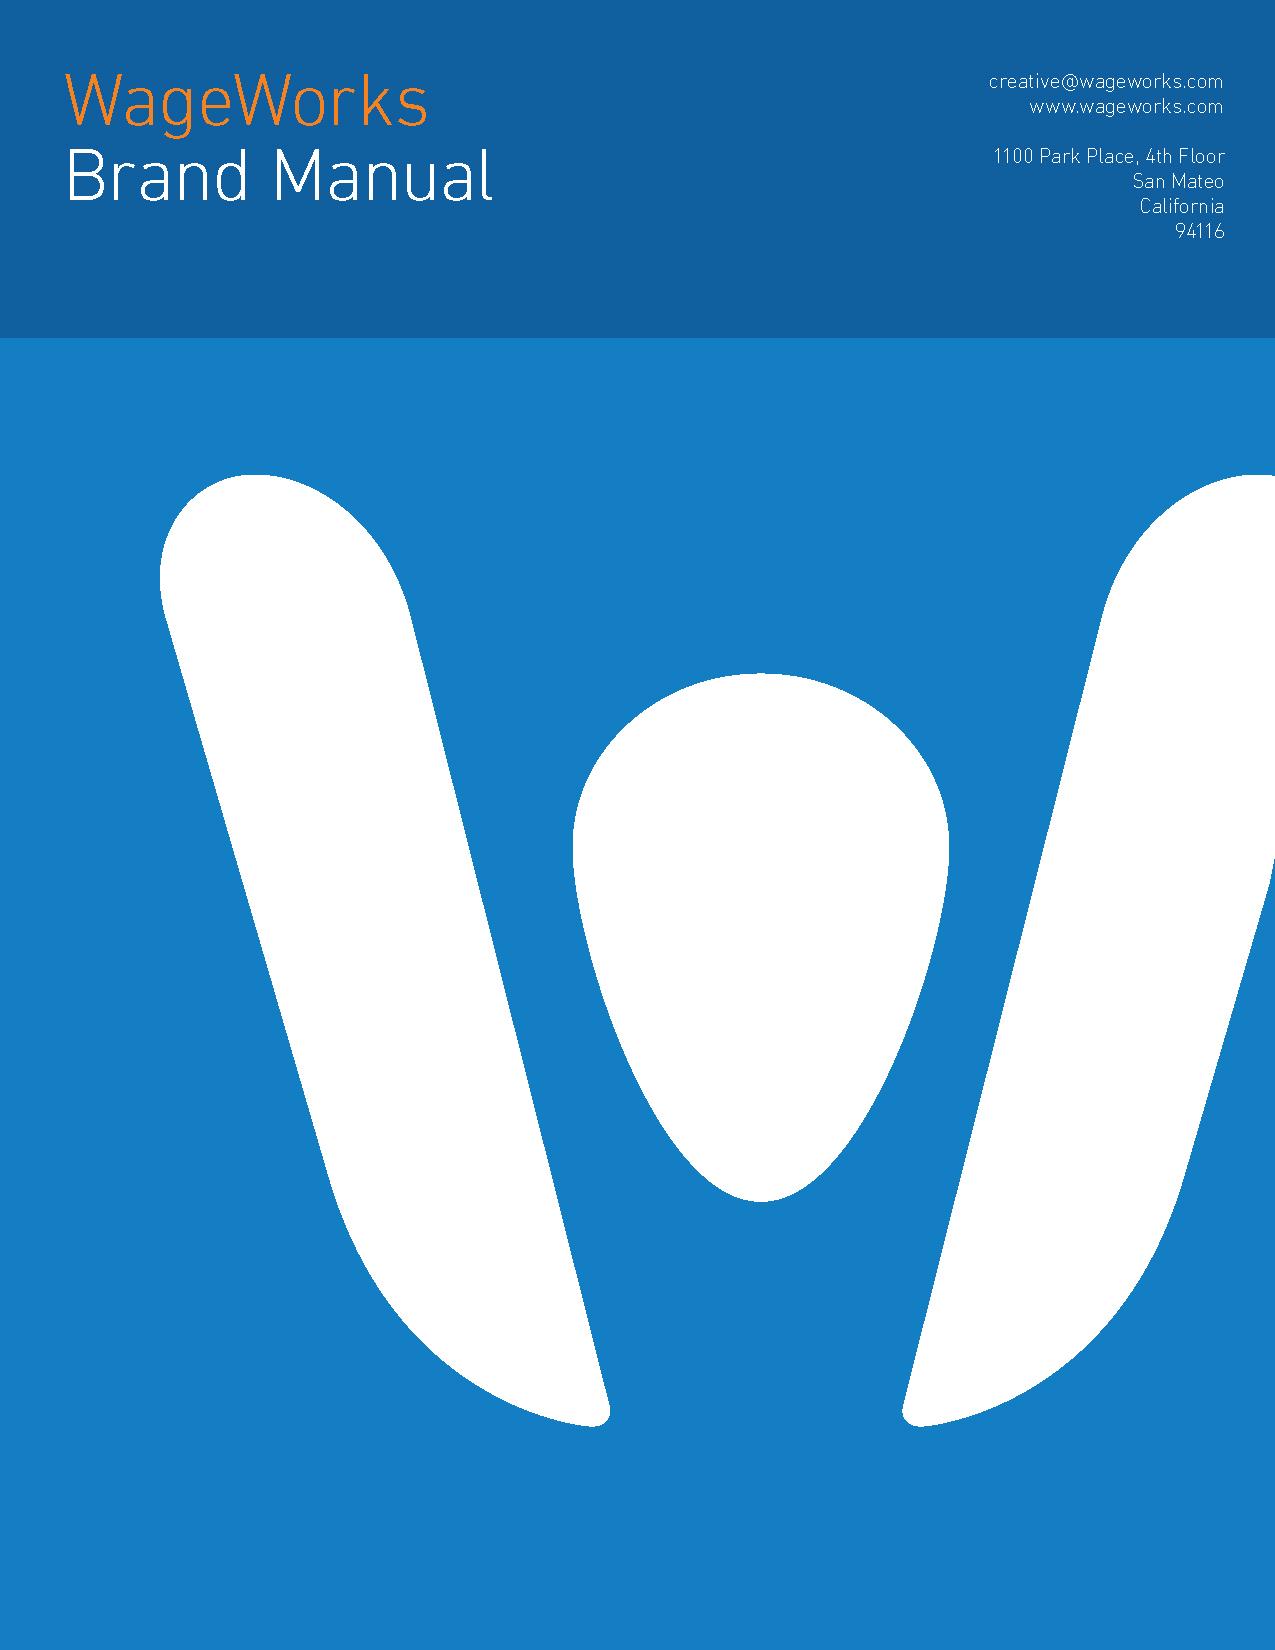 WW-BrandManual-December2016-2_in_Progress_Page_01.jpg